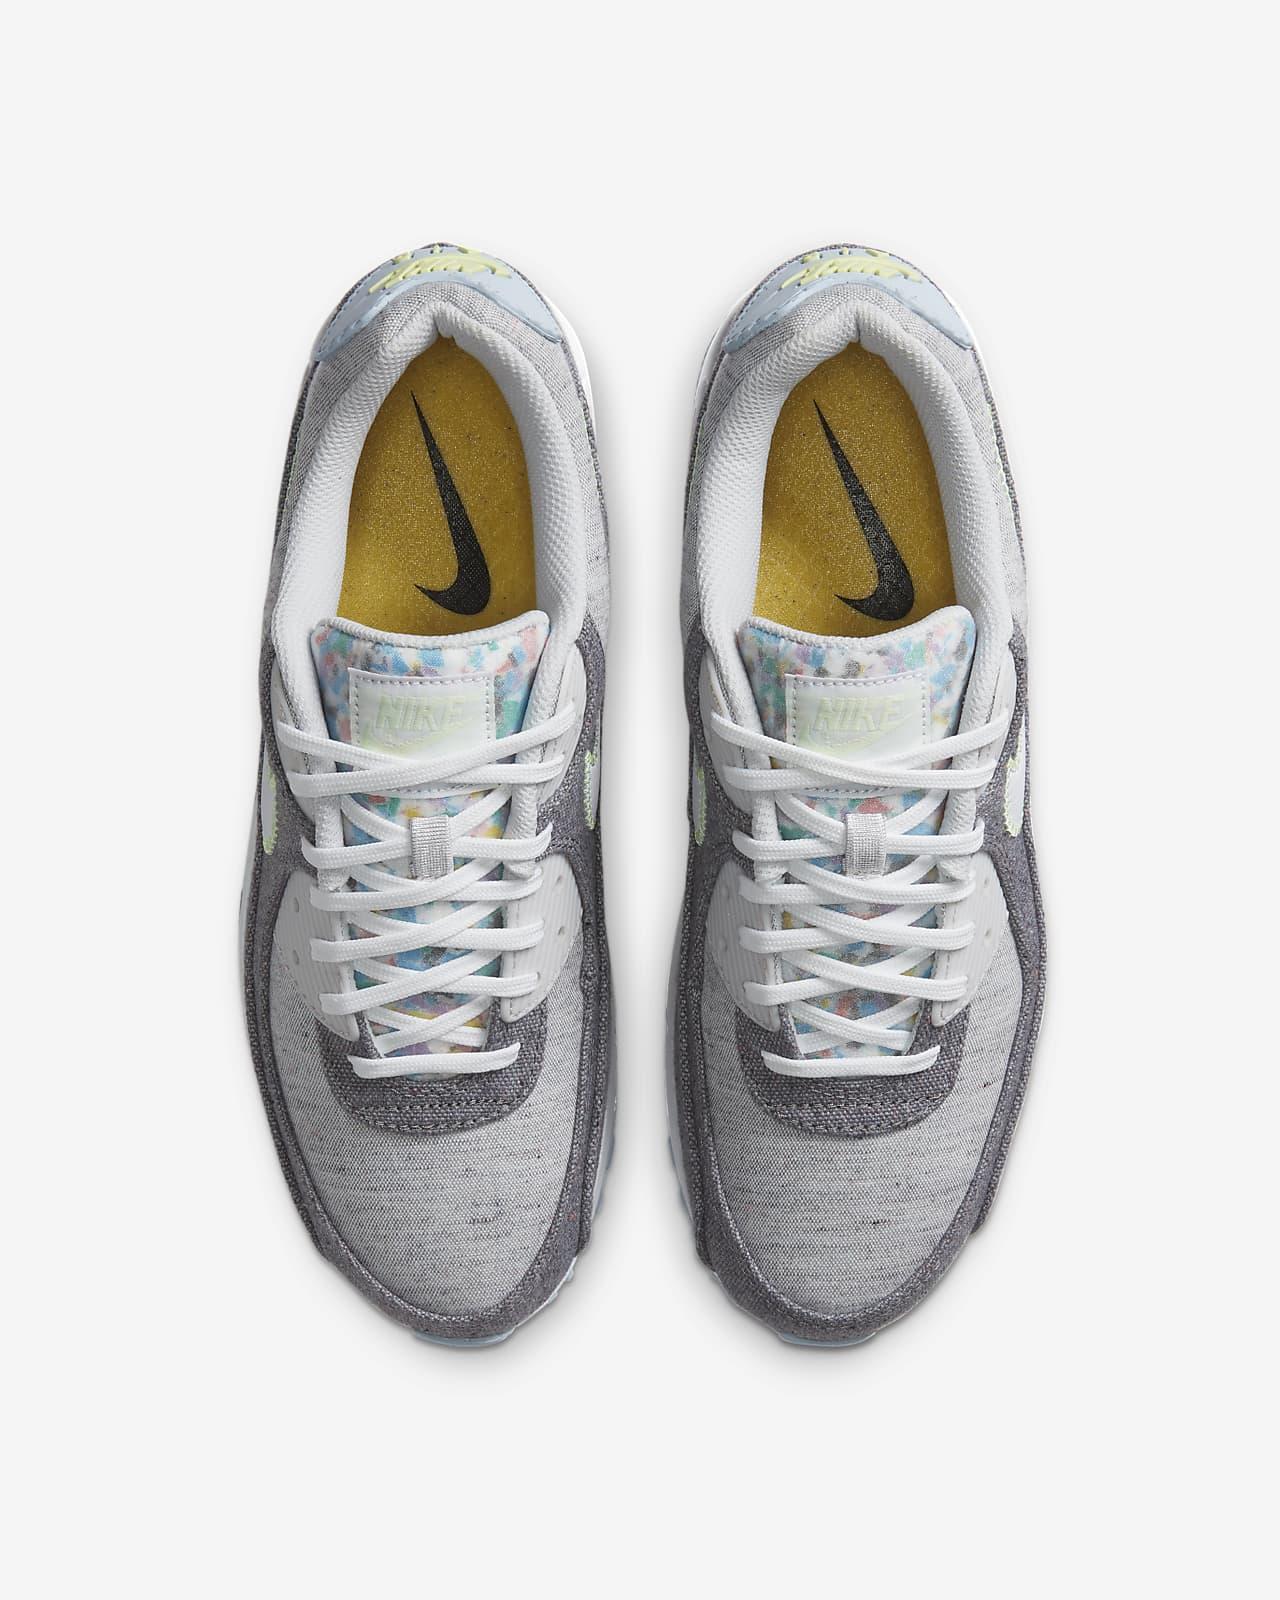 Nike Air Max 90 NRG Men's Shoe